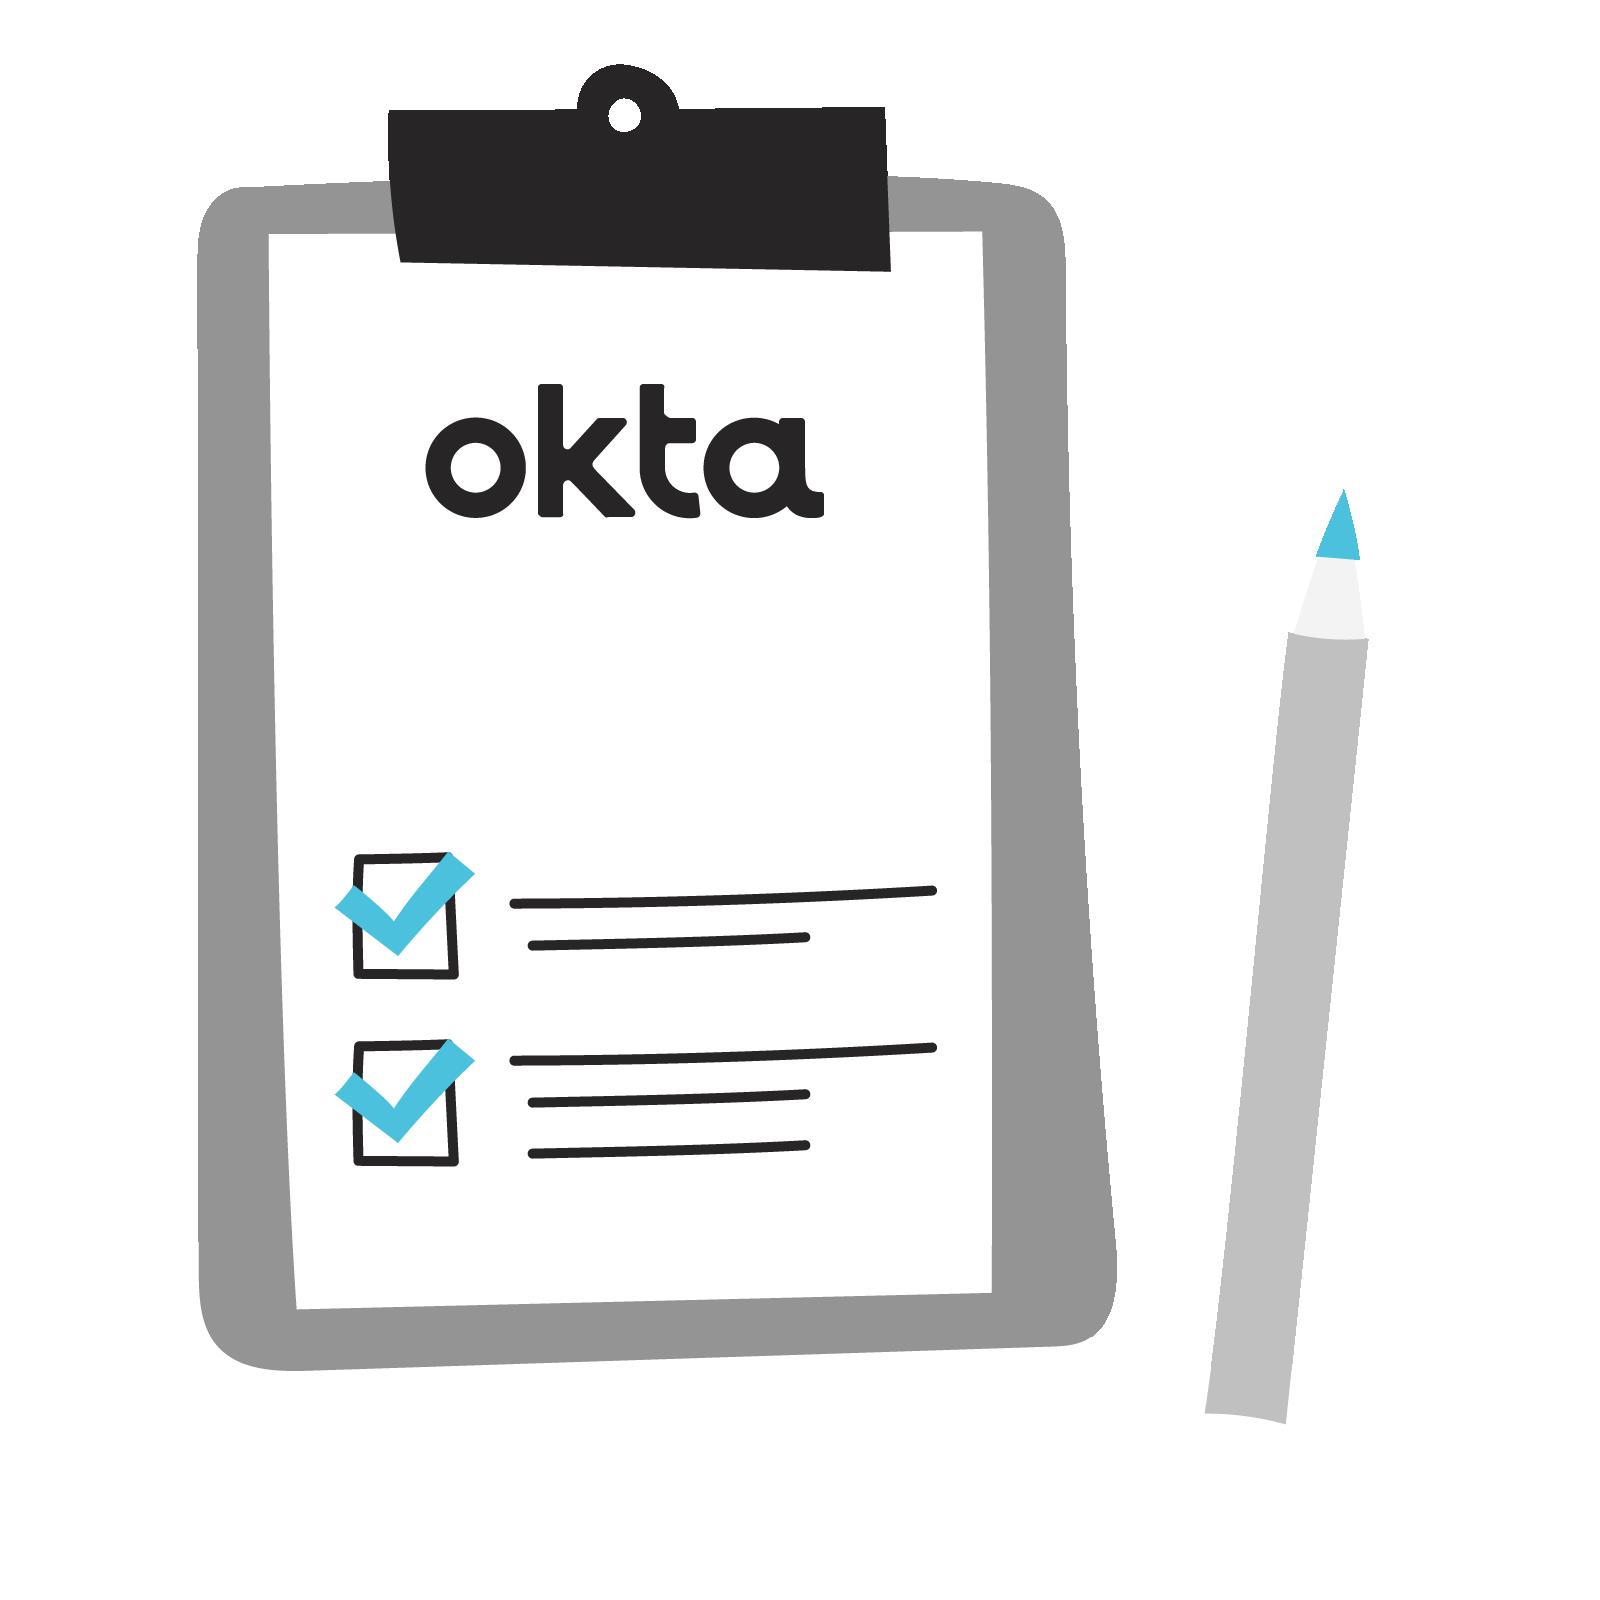 How Okta achieved 99% brand consistency with SketchDeck